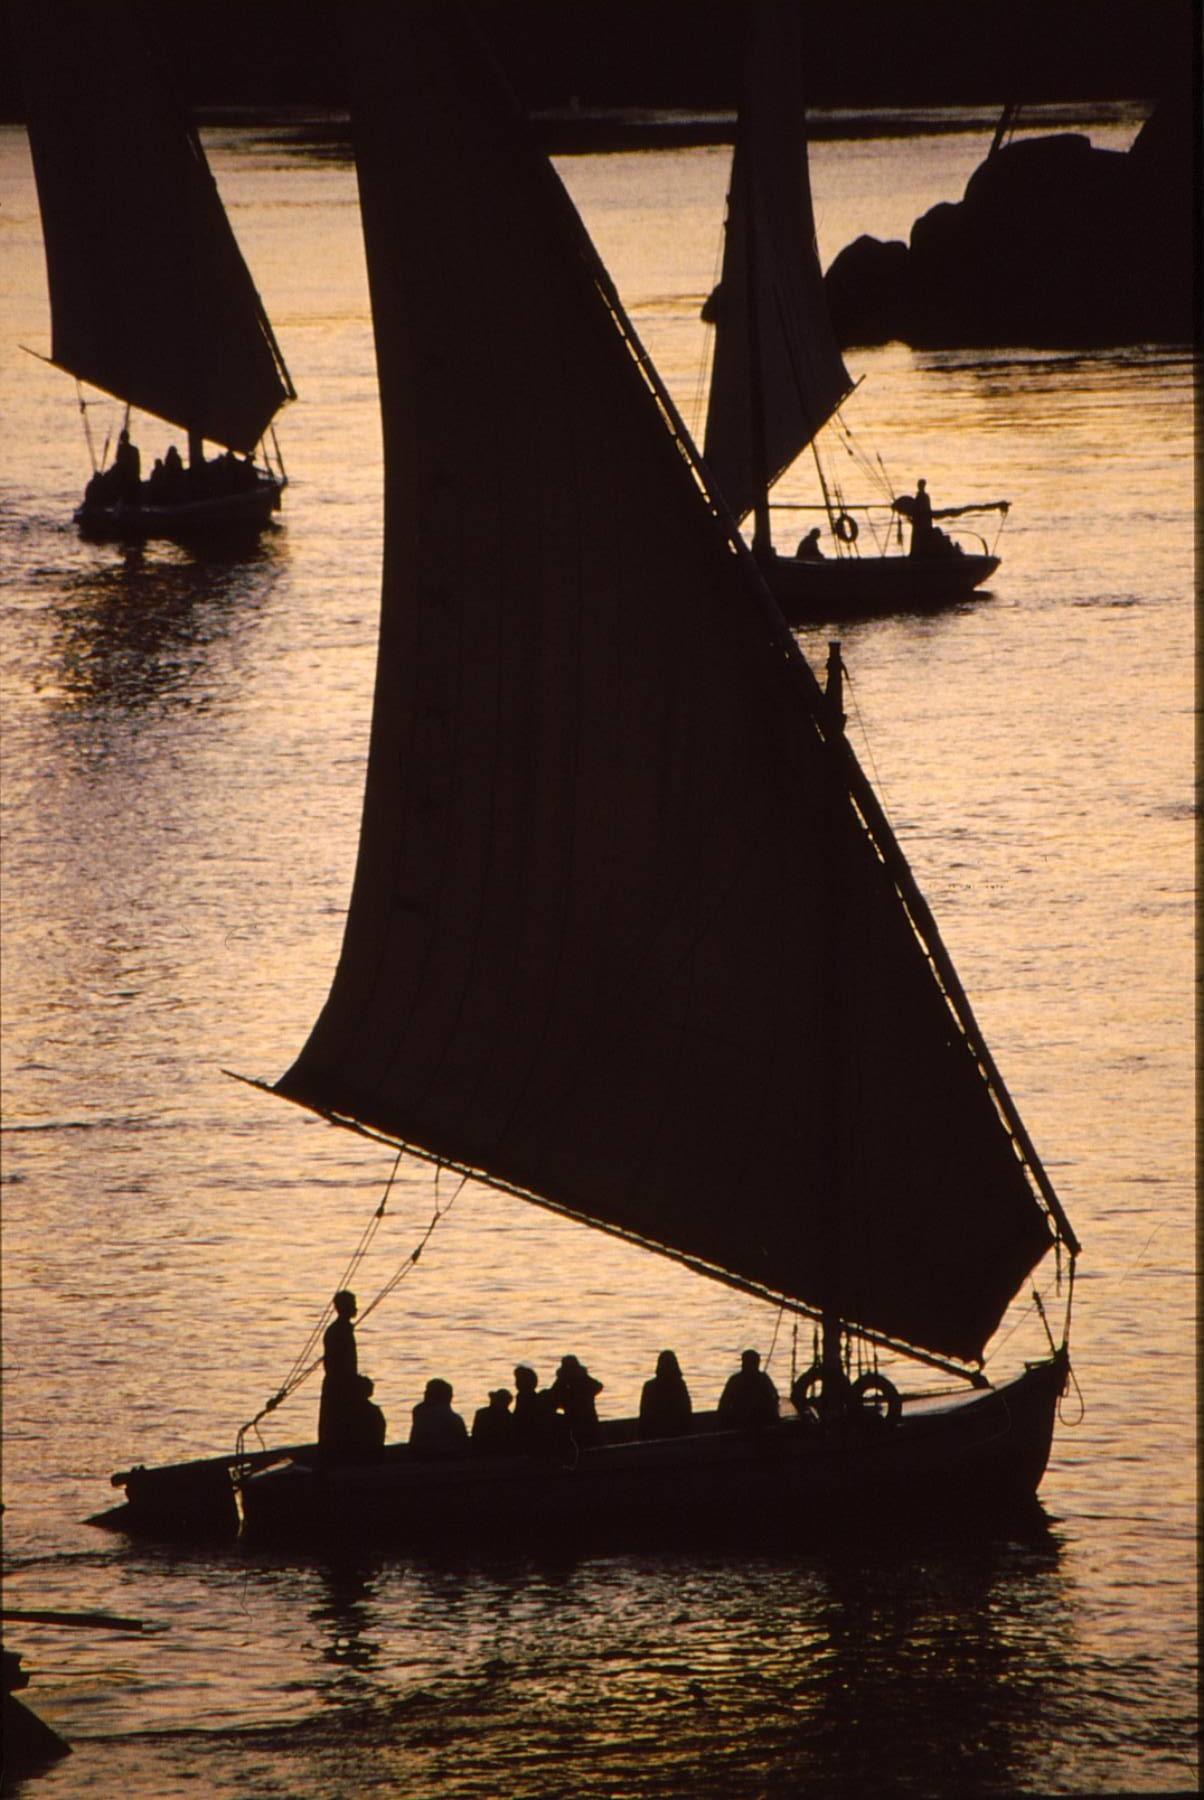 Felucca sails at sunset